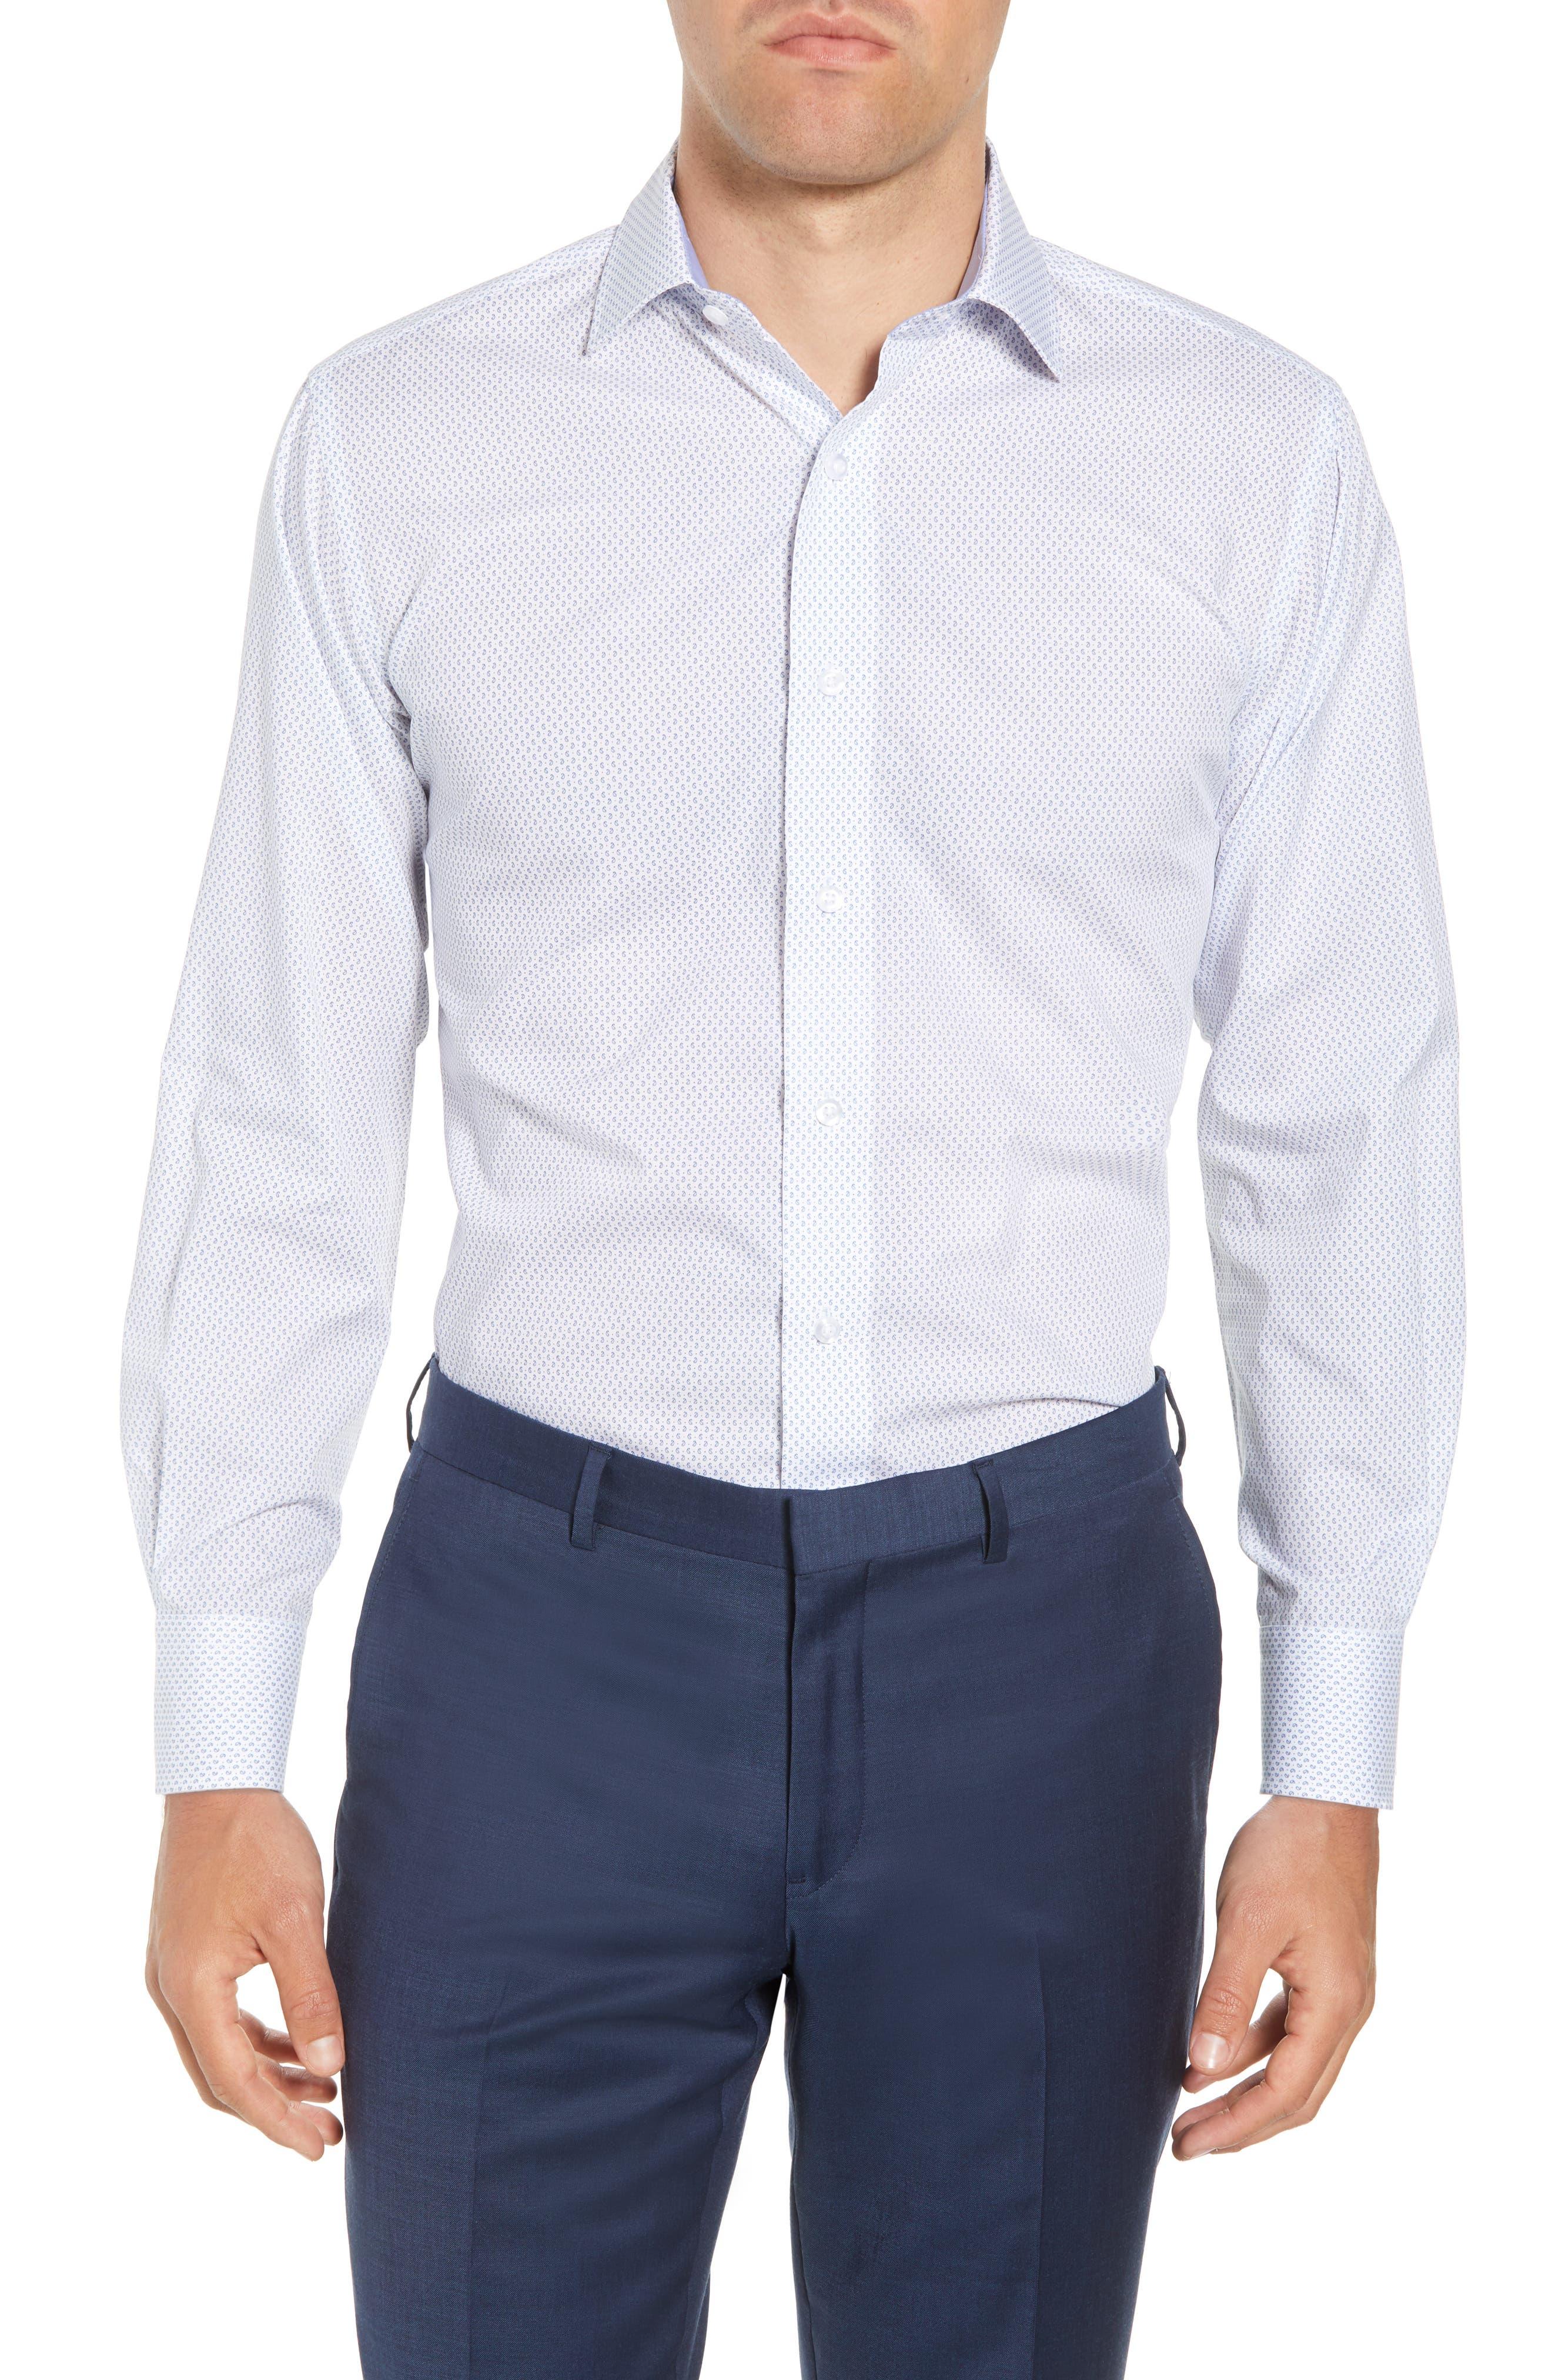 LORENZO UOMO Trim Fit Paisley Dress Shirt, Main, color, 400